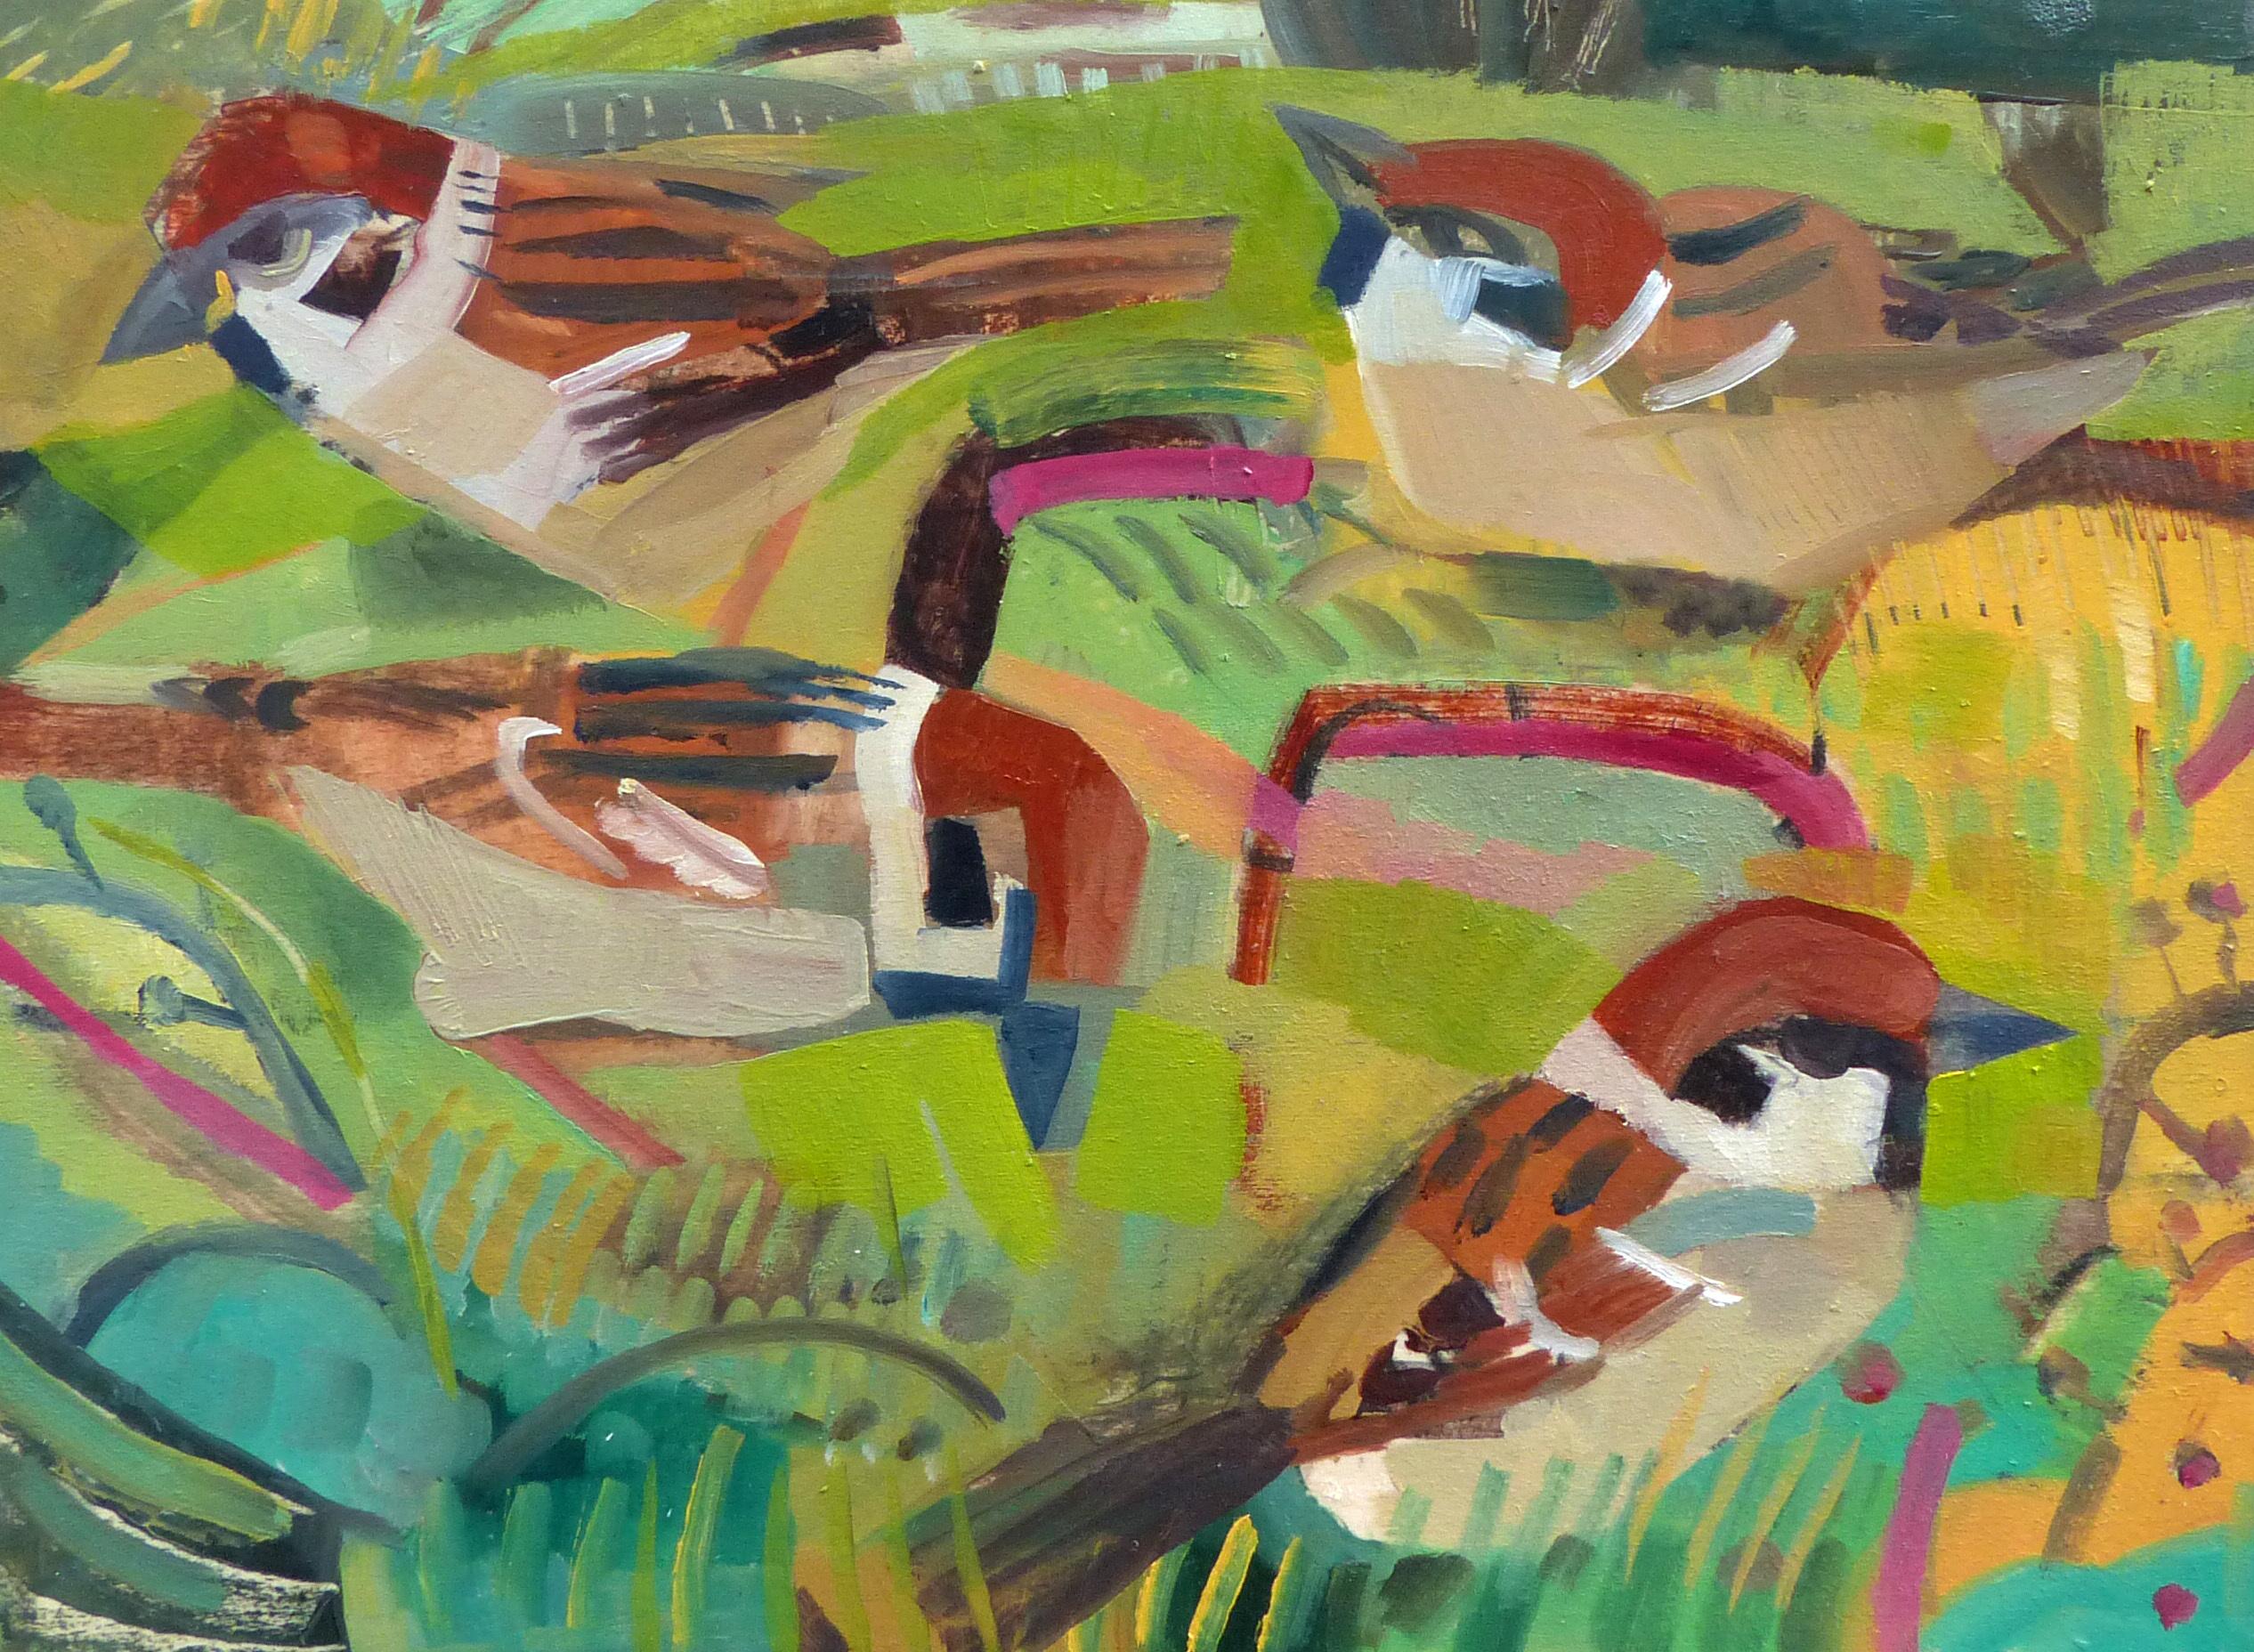 Garden Tree Sparrows, Oil on board, 23 cm x 31 cm